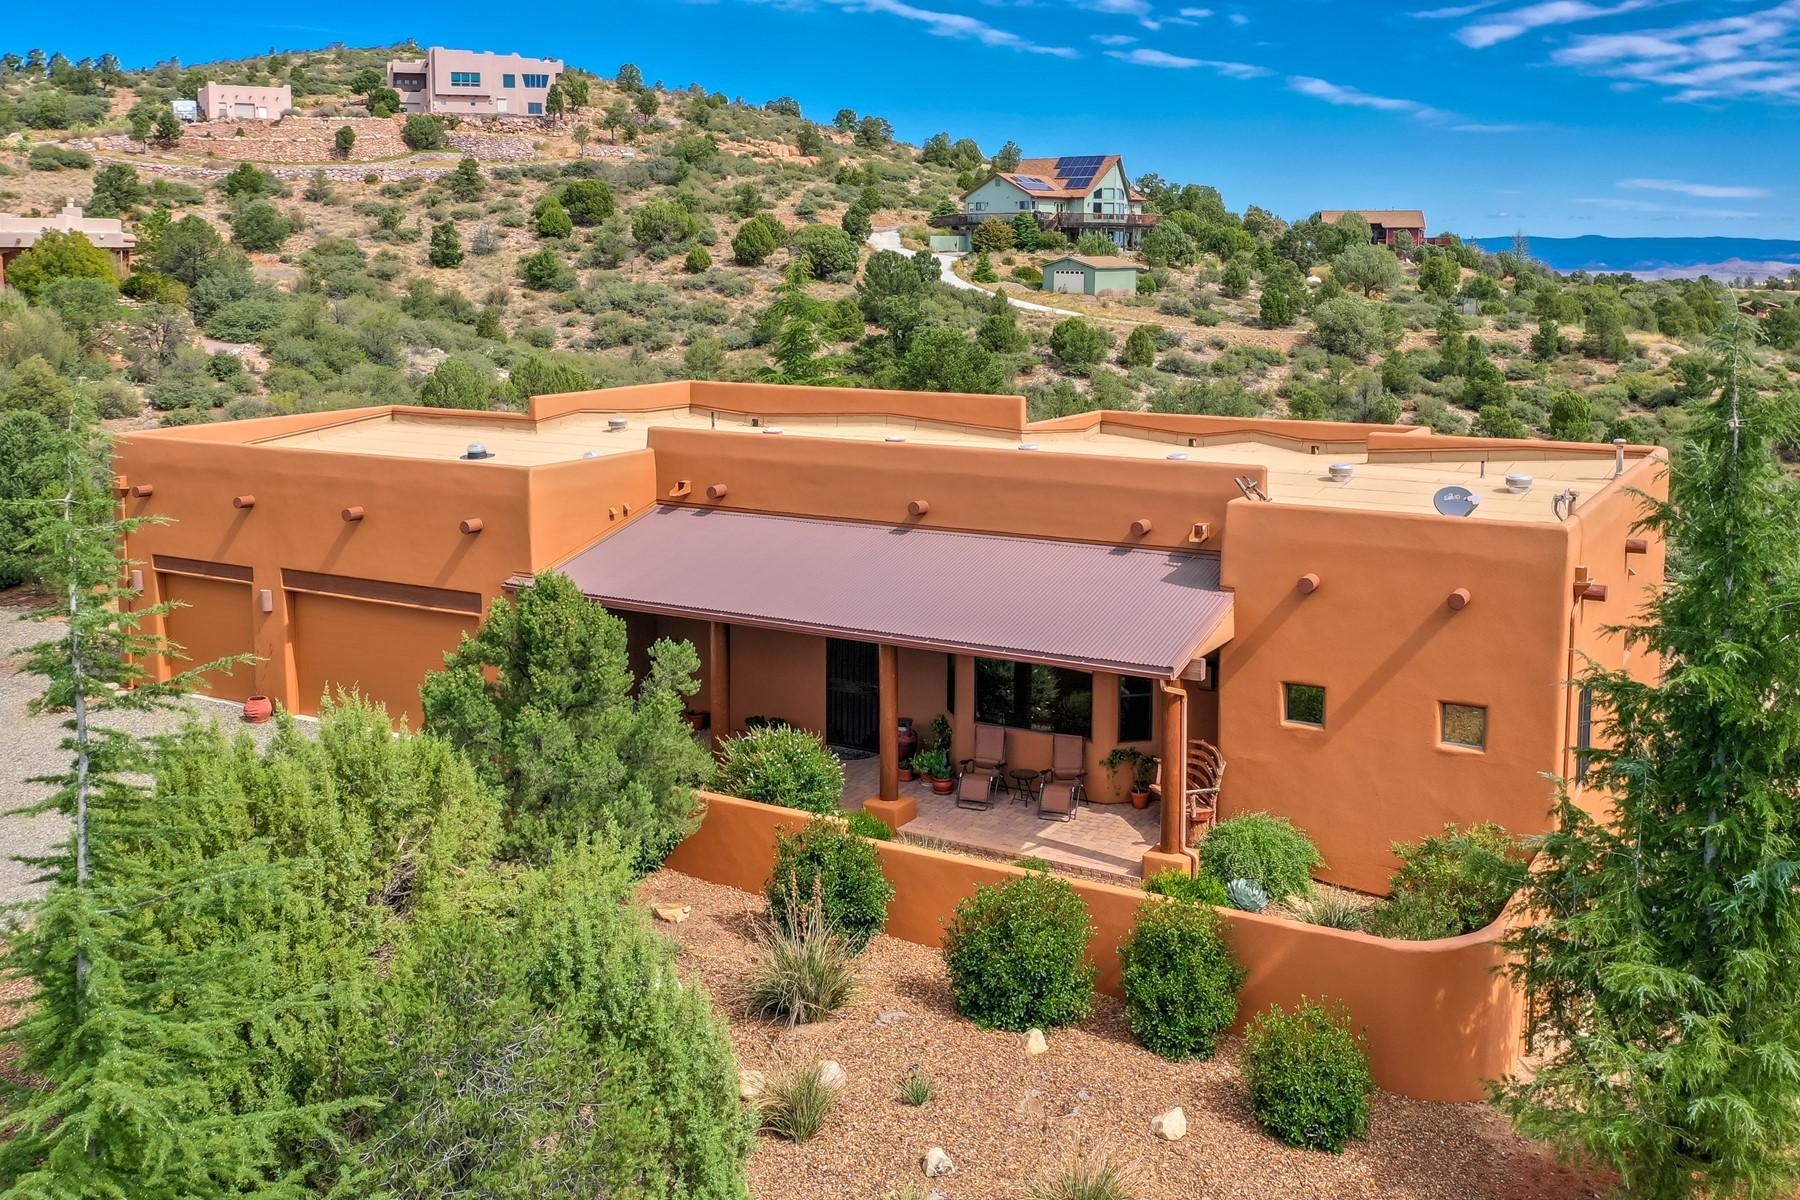 Single Family Homes 为 销售 在 Williamson Valley Heights 12535 N Flying Hawk Trail 普雷斯科特, 亚利桑那州 86305 美国